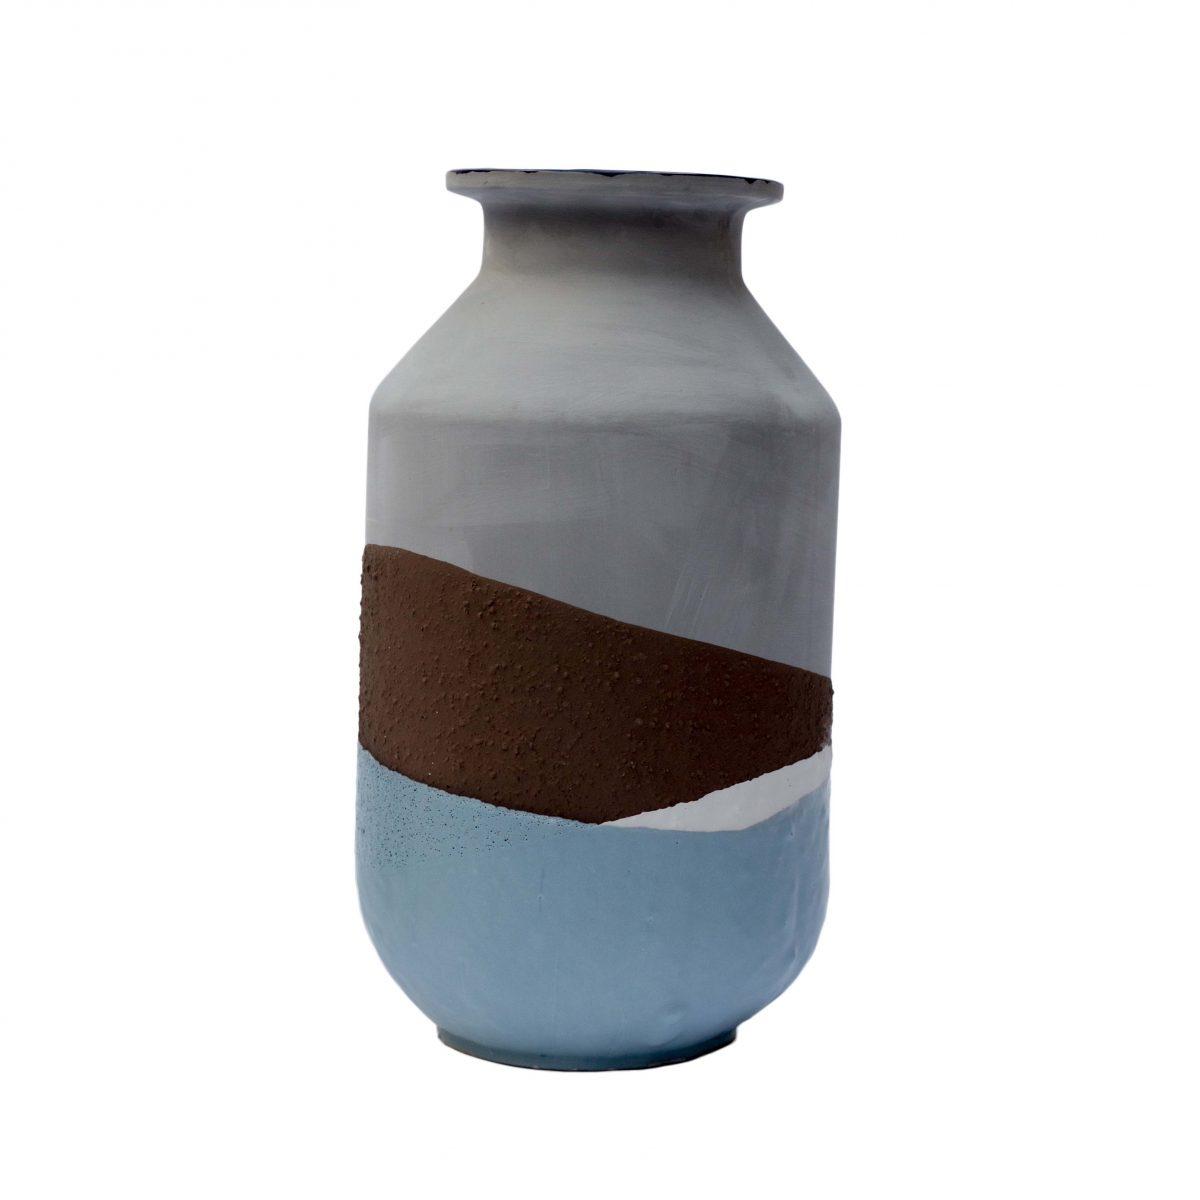 Jeroen Wand for Cor Unum – Plunge Vase gimmiishop